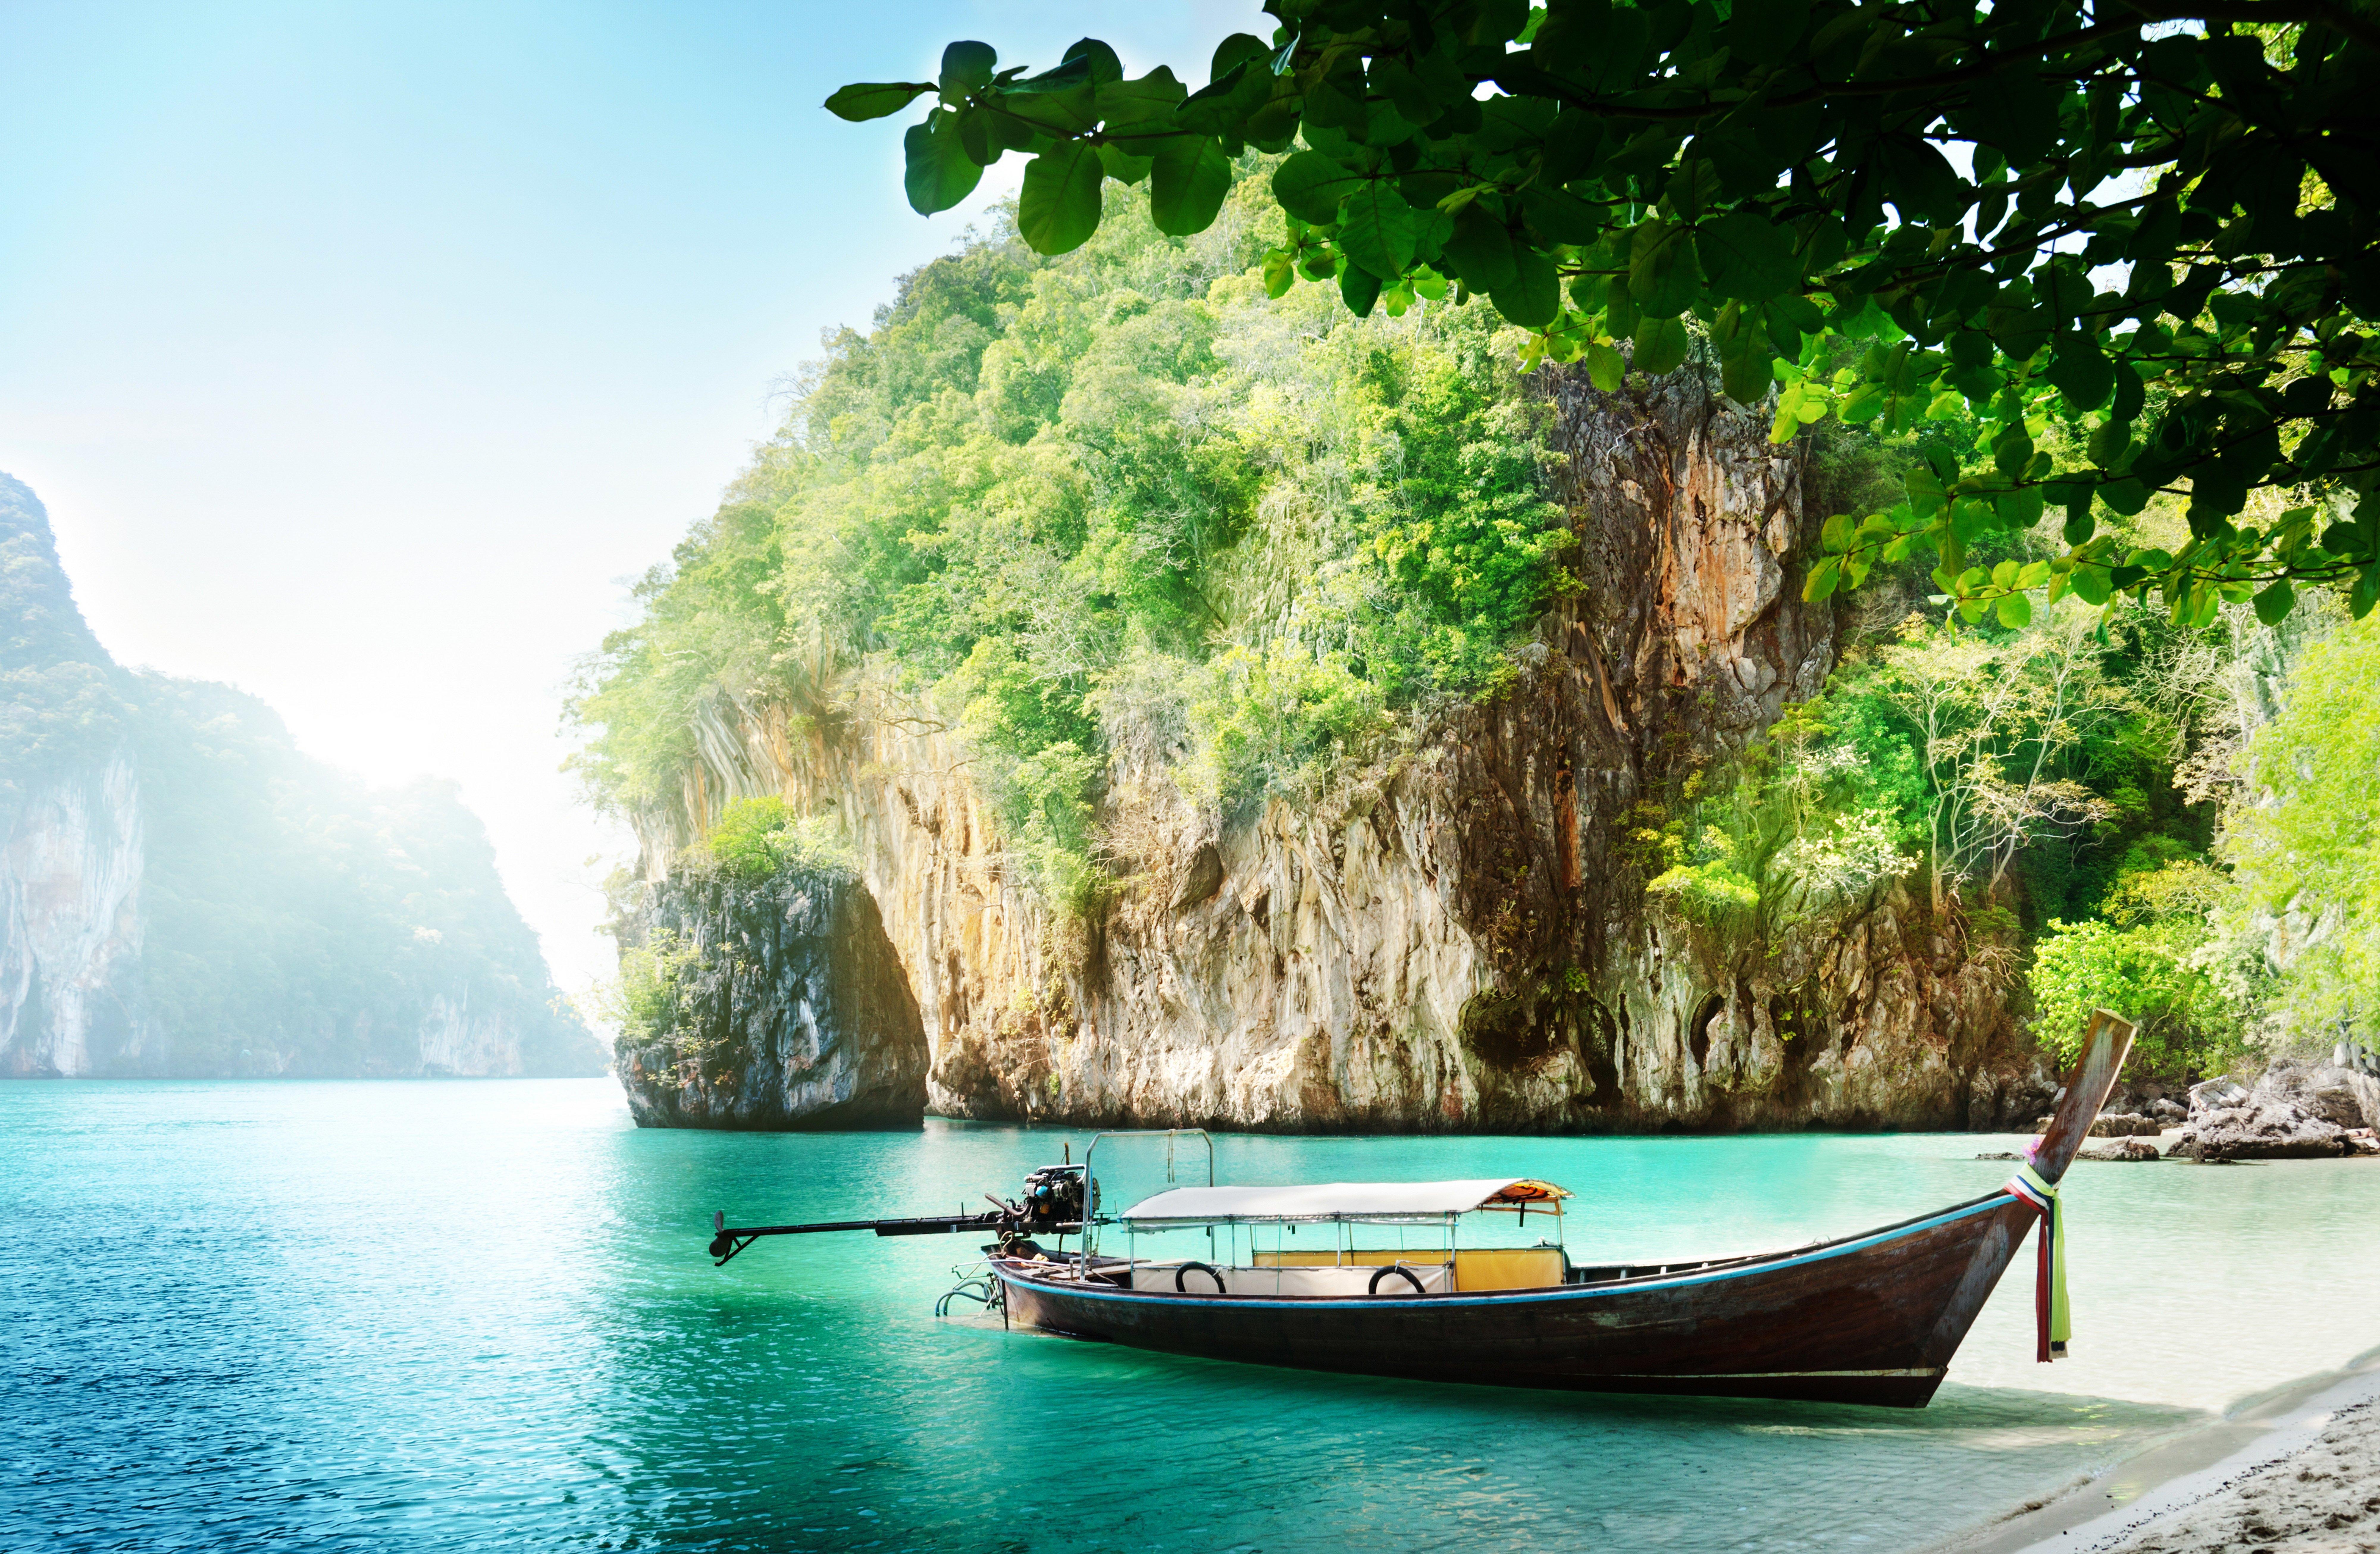 Food ultra hd 4k 5k 8k wallpapers page 1 - Boats Thailand Sea Crag Nature Wallpaper